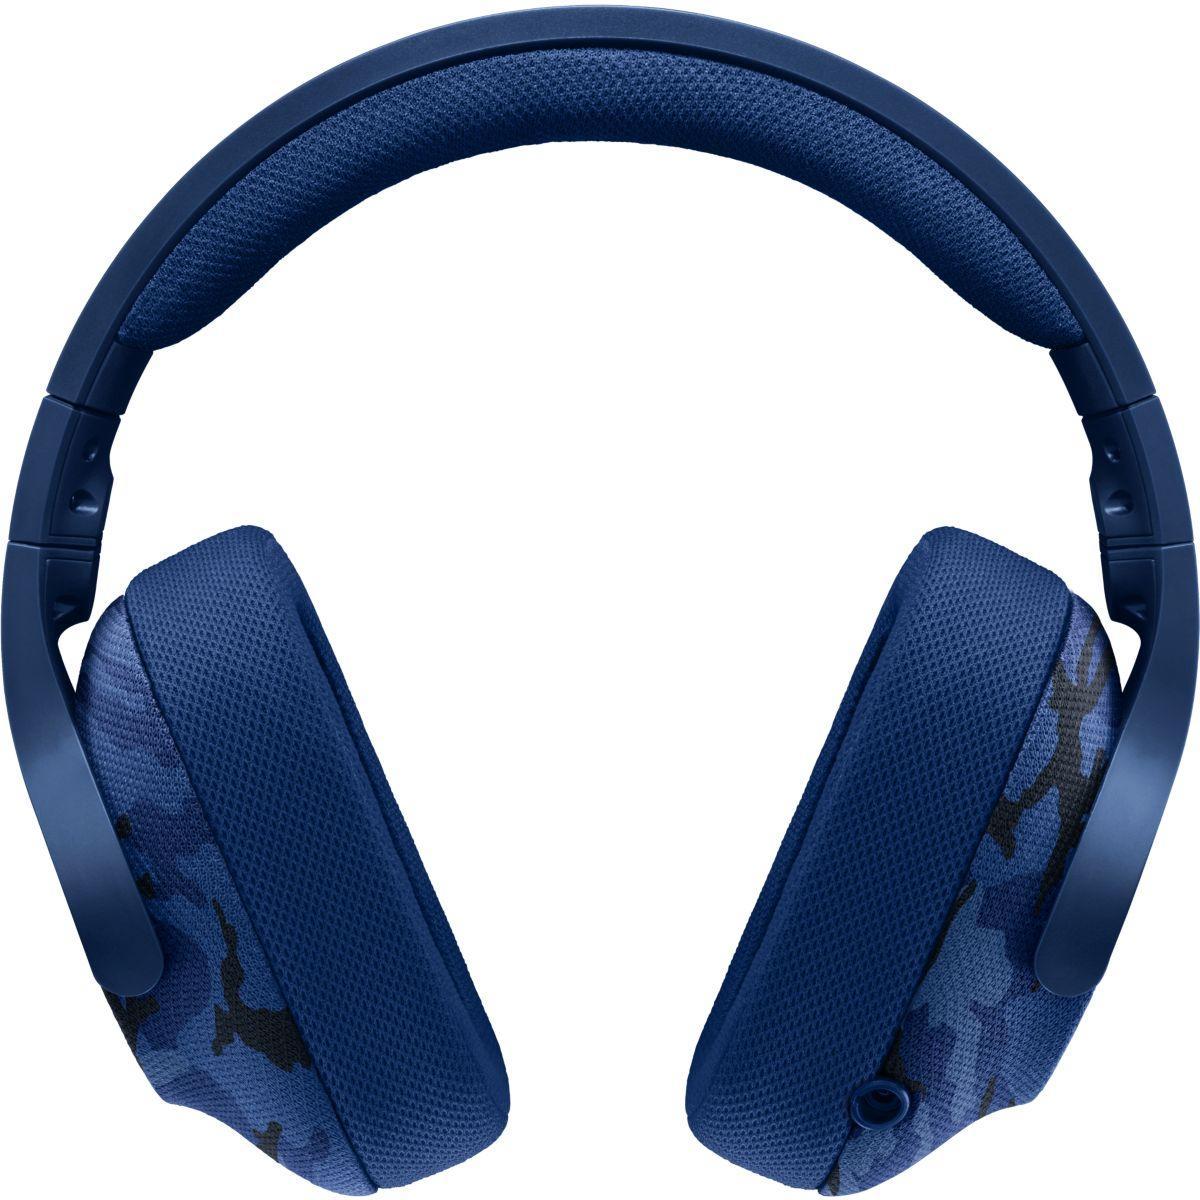 Casque micro logitech g433 7.1 bleu camo - 2% de remise imm�diate avec le code : green2